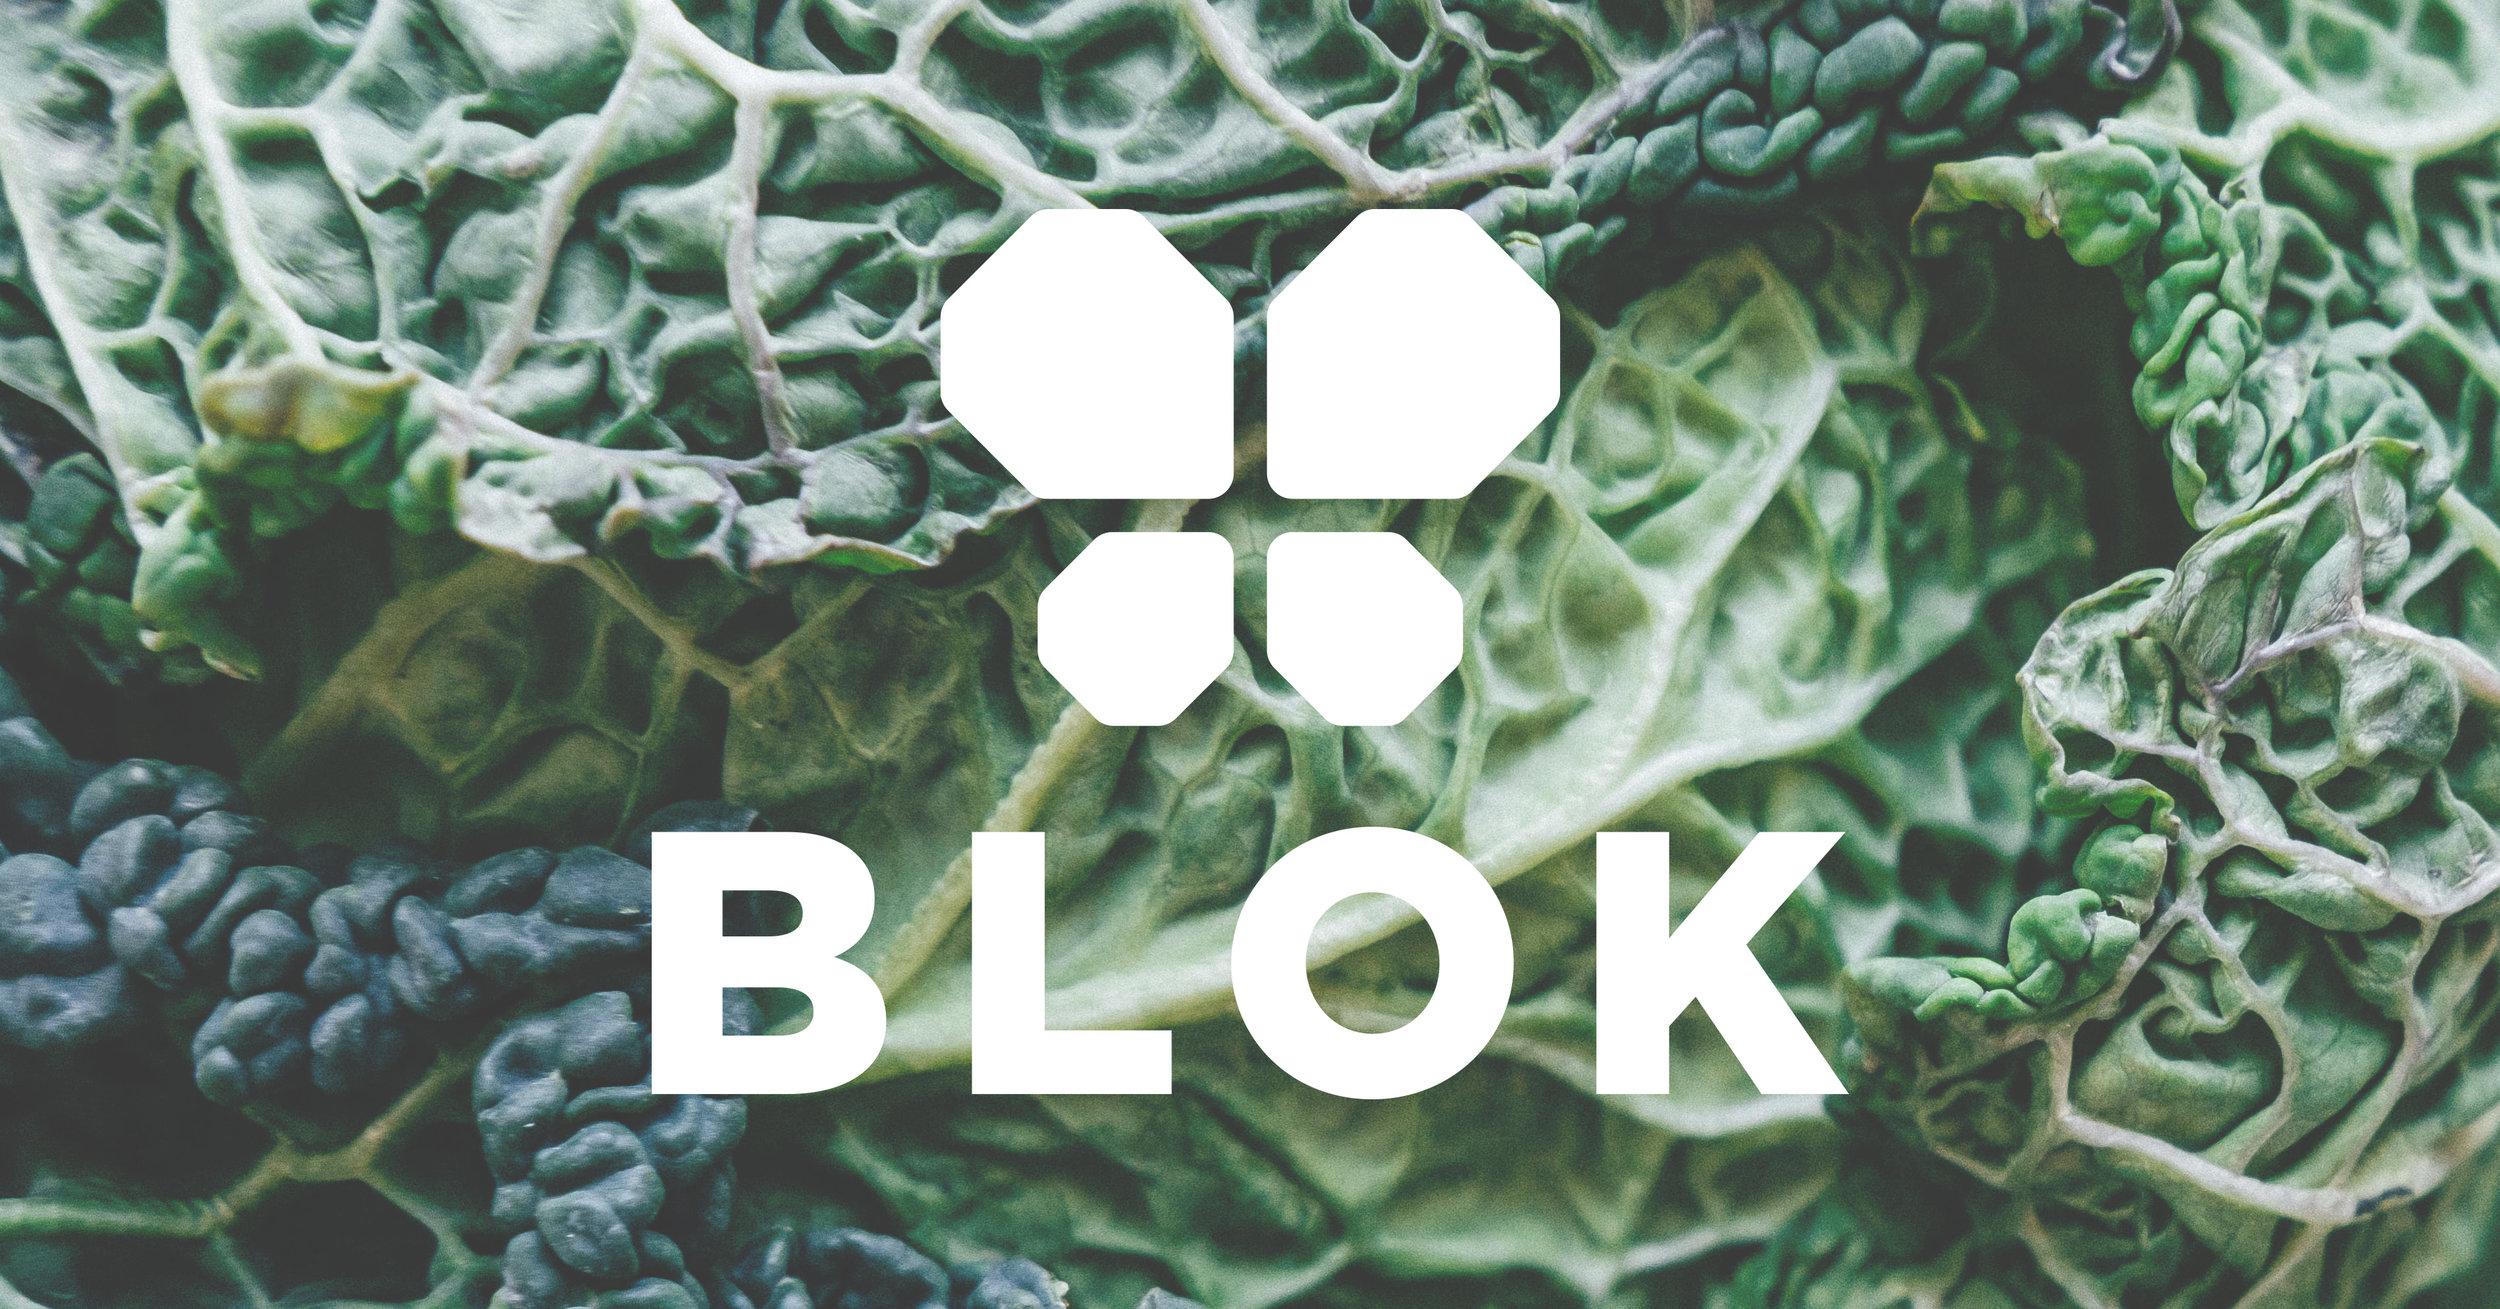 blok-logo-we-are-plant-forward.jpg